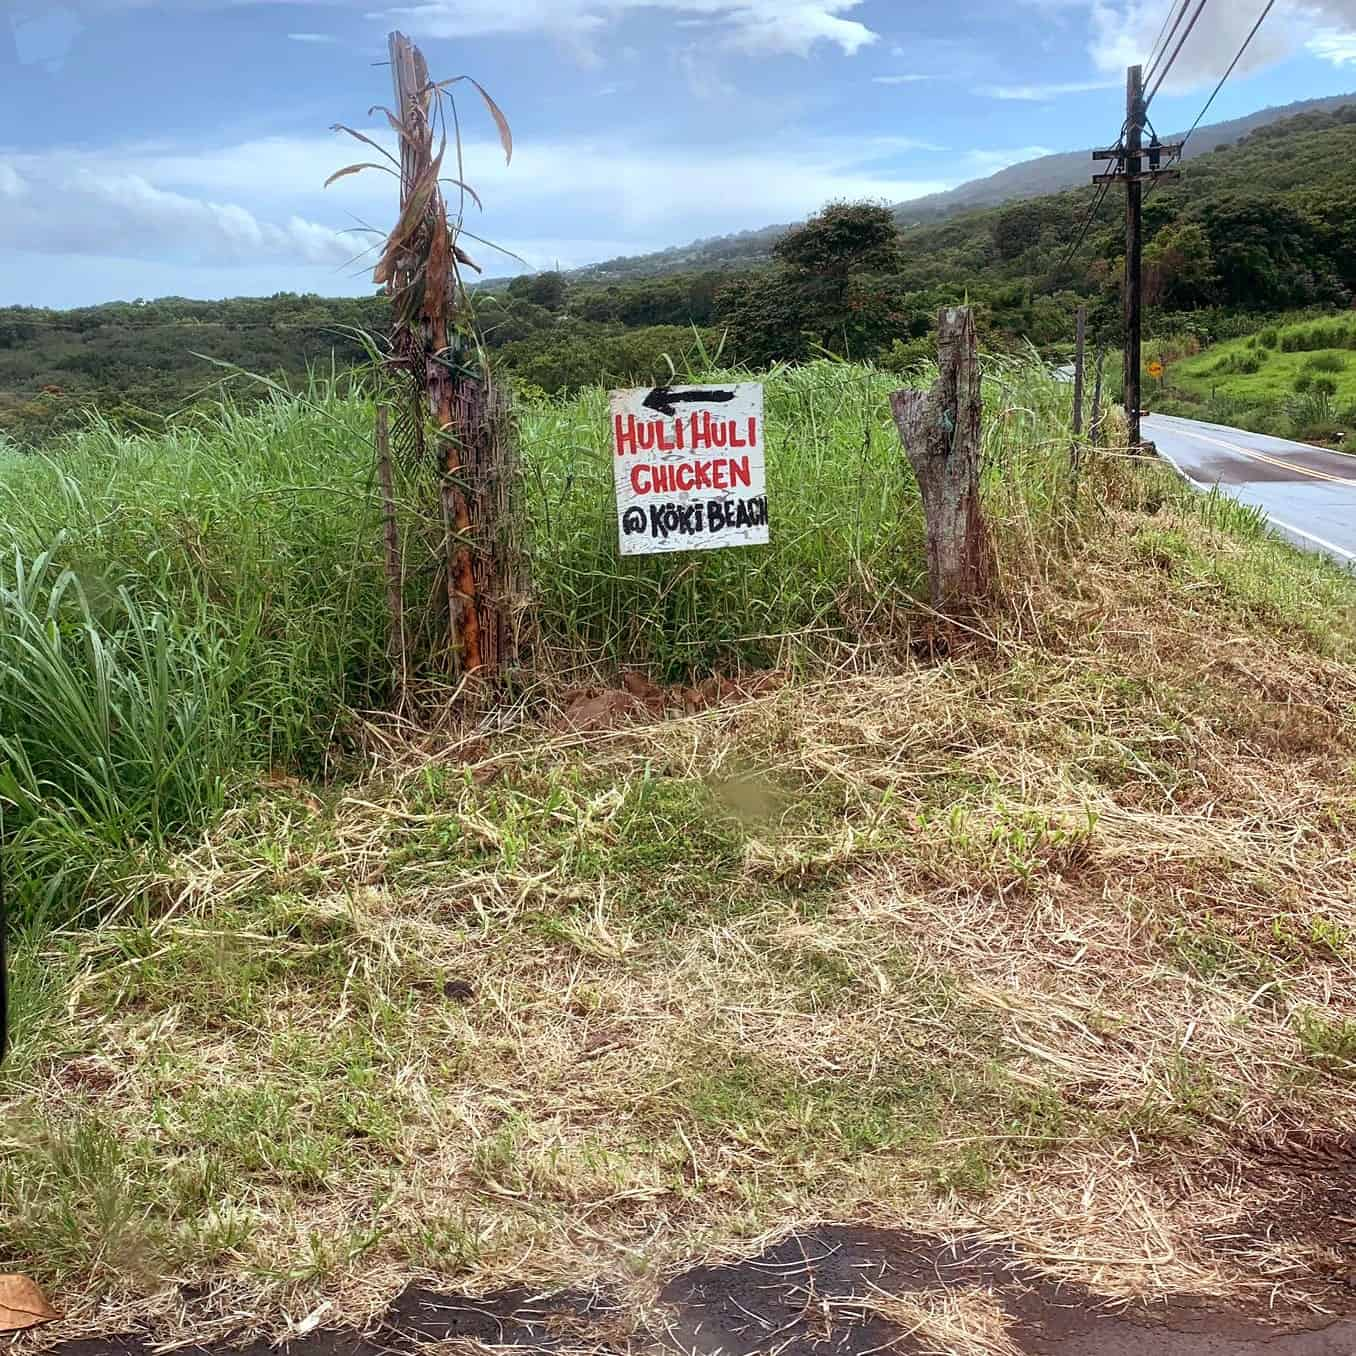 incredible roadside Huli Huli Chicken stand in Maui!